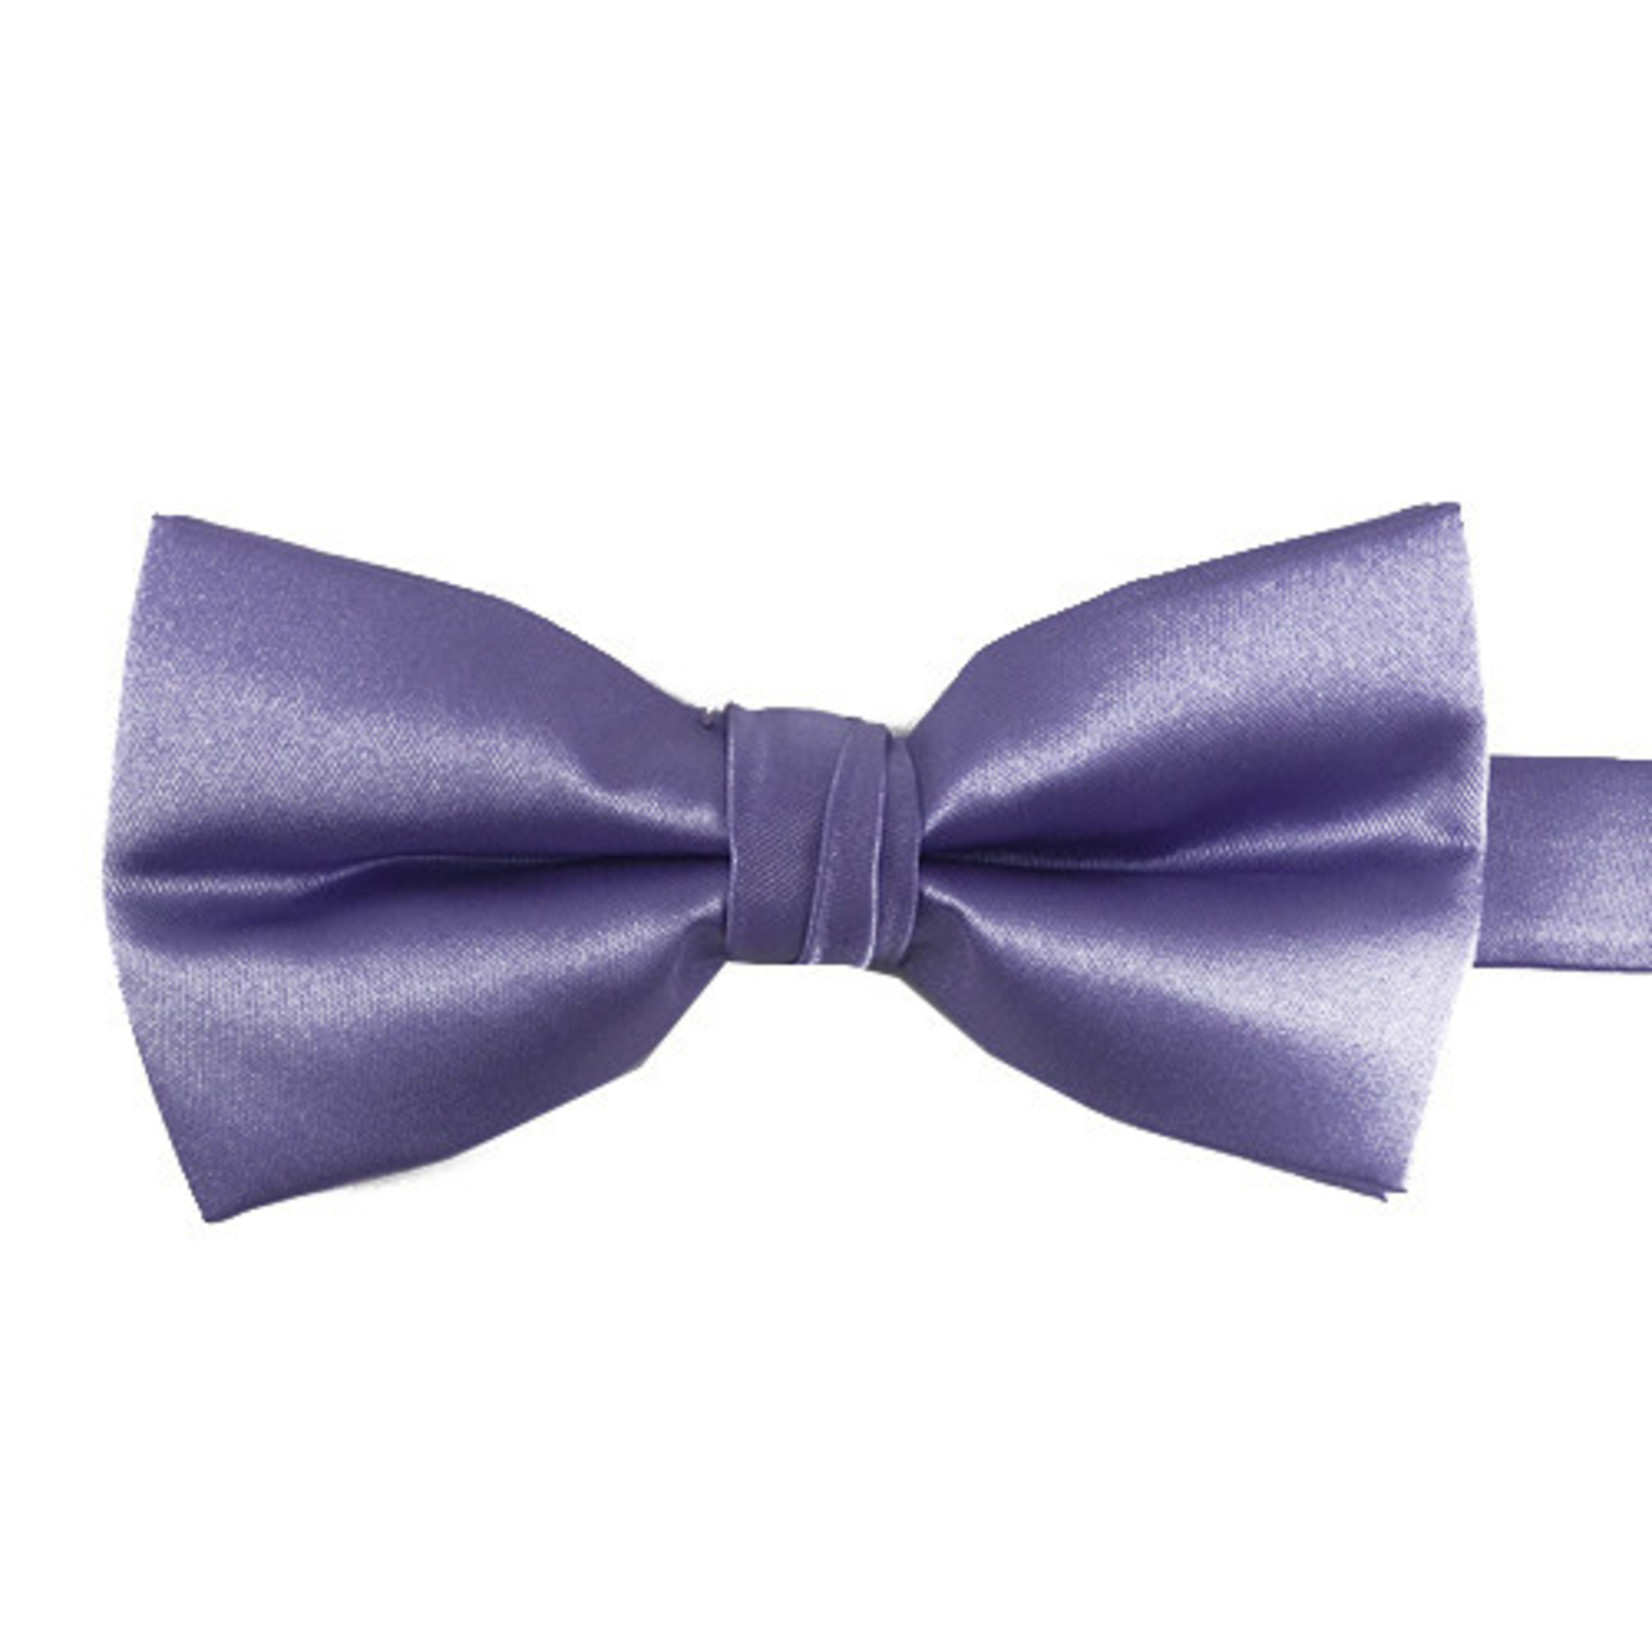 Knotz M100BT-13 Solid Lilac Bowtie